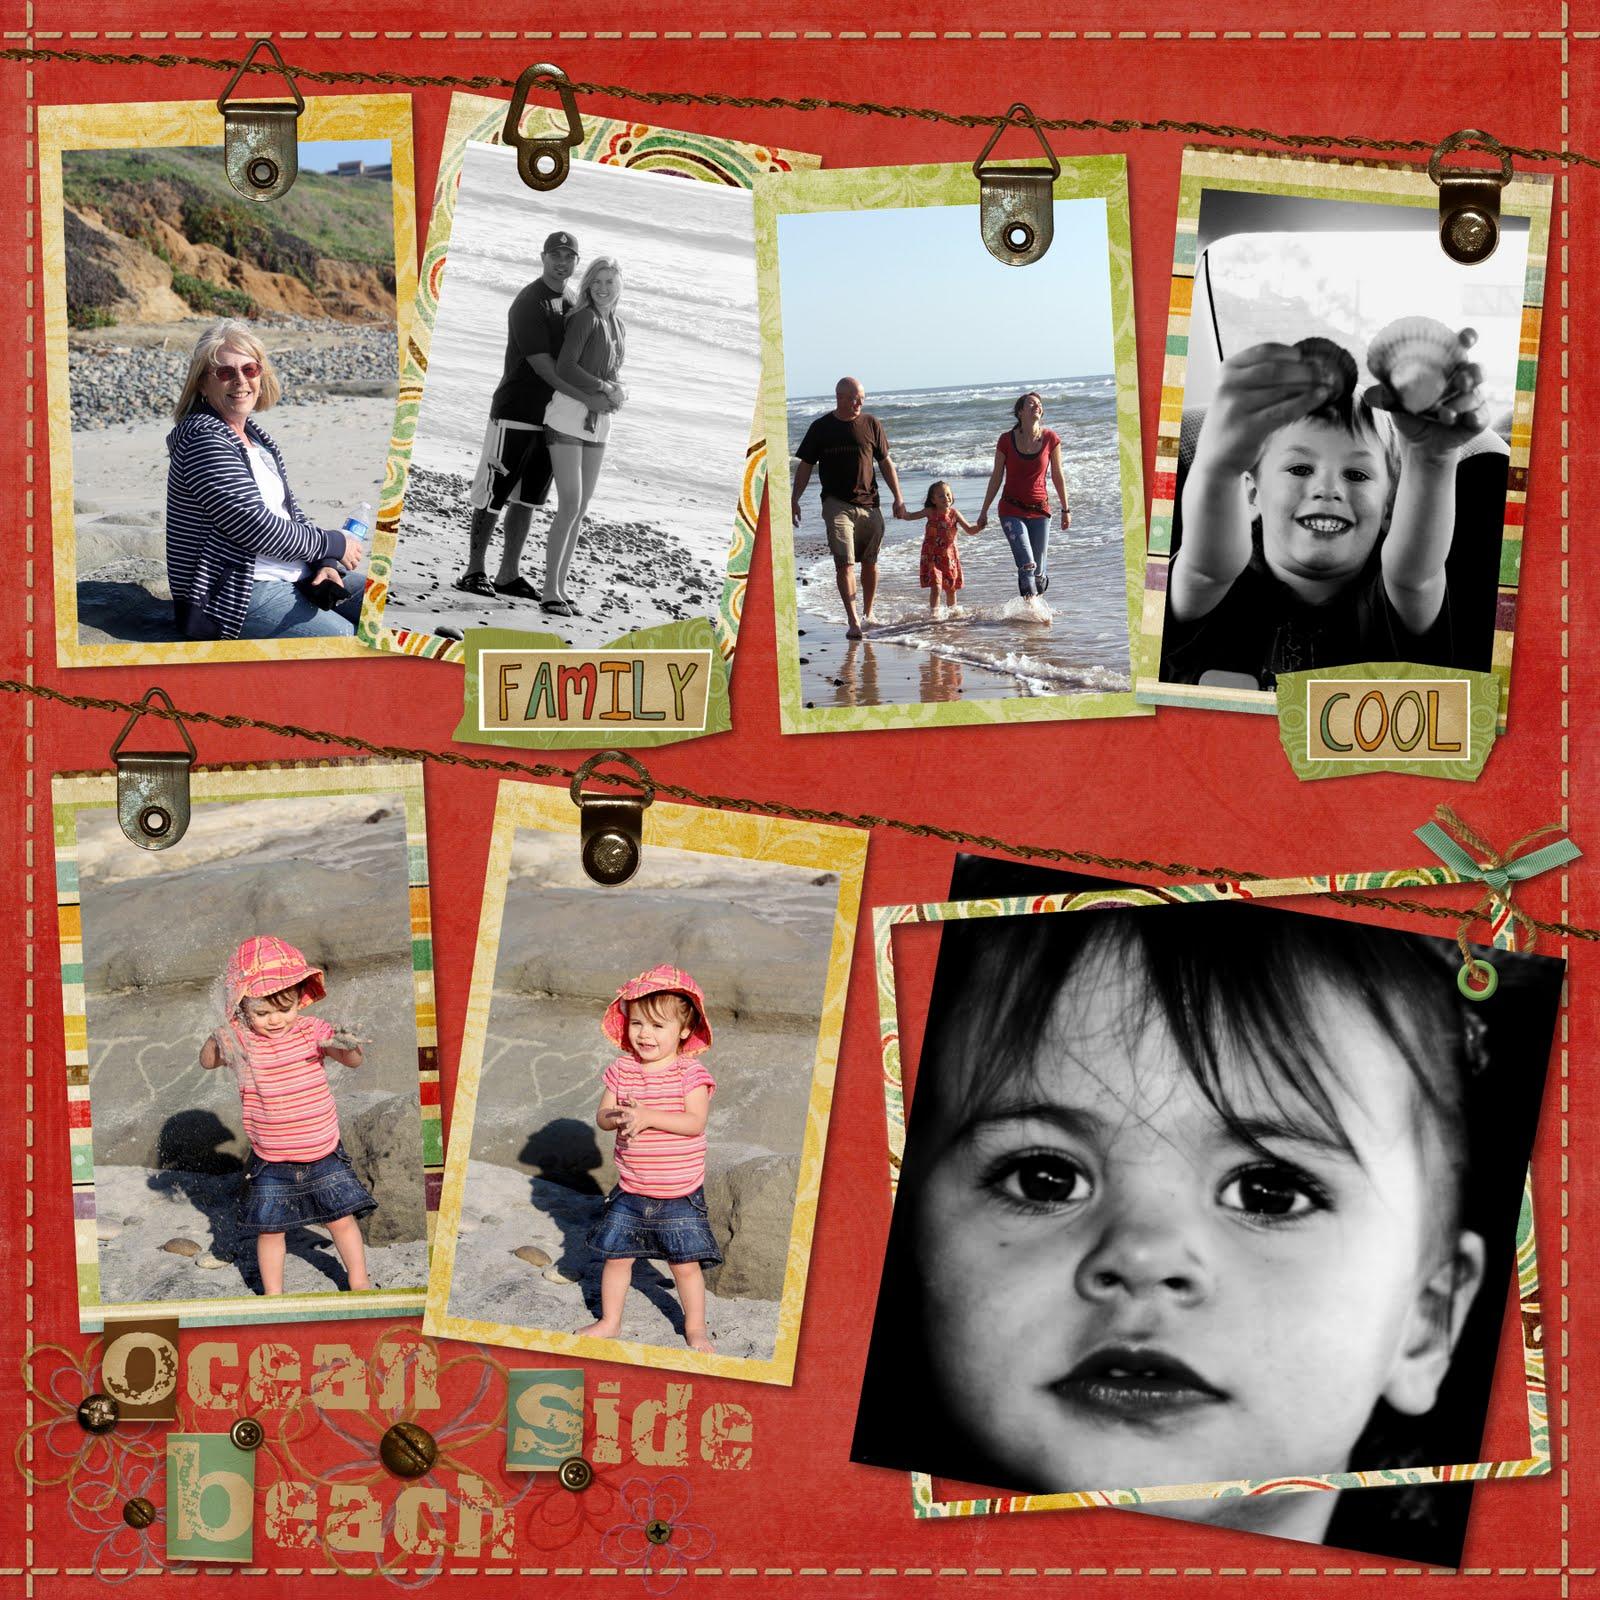 Family scrapbook ideas on pinterest - Mommaru Blog Scrapbooking Ideas Family